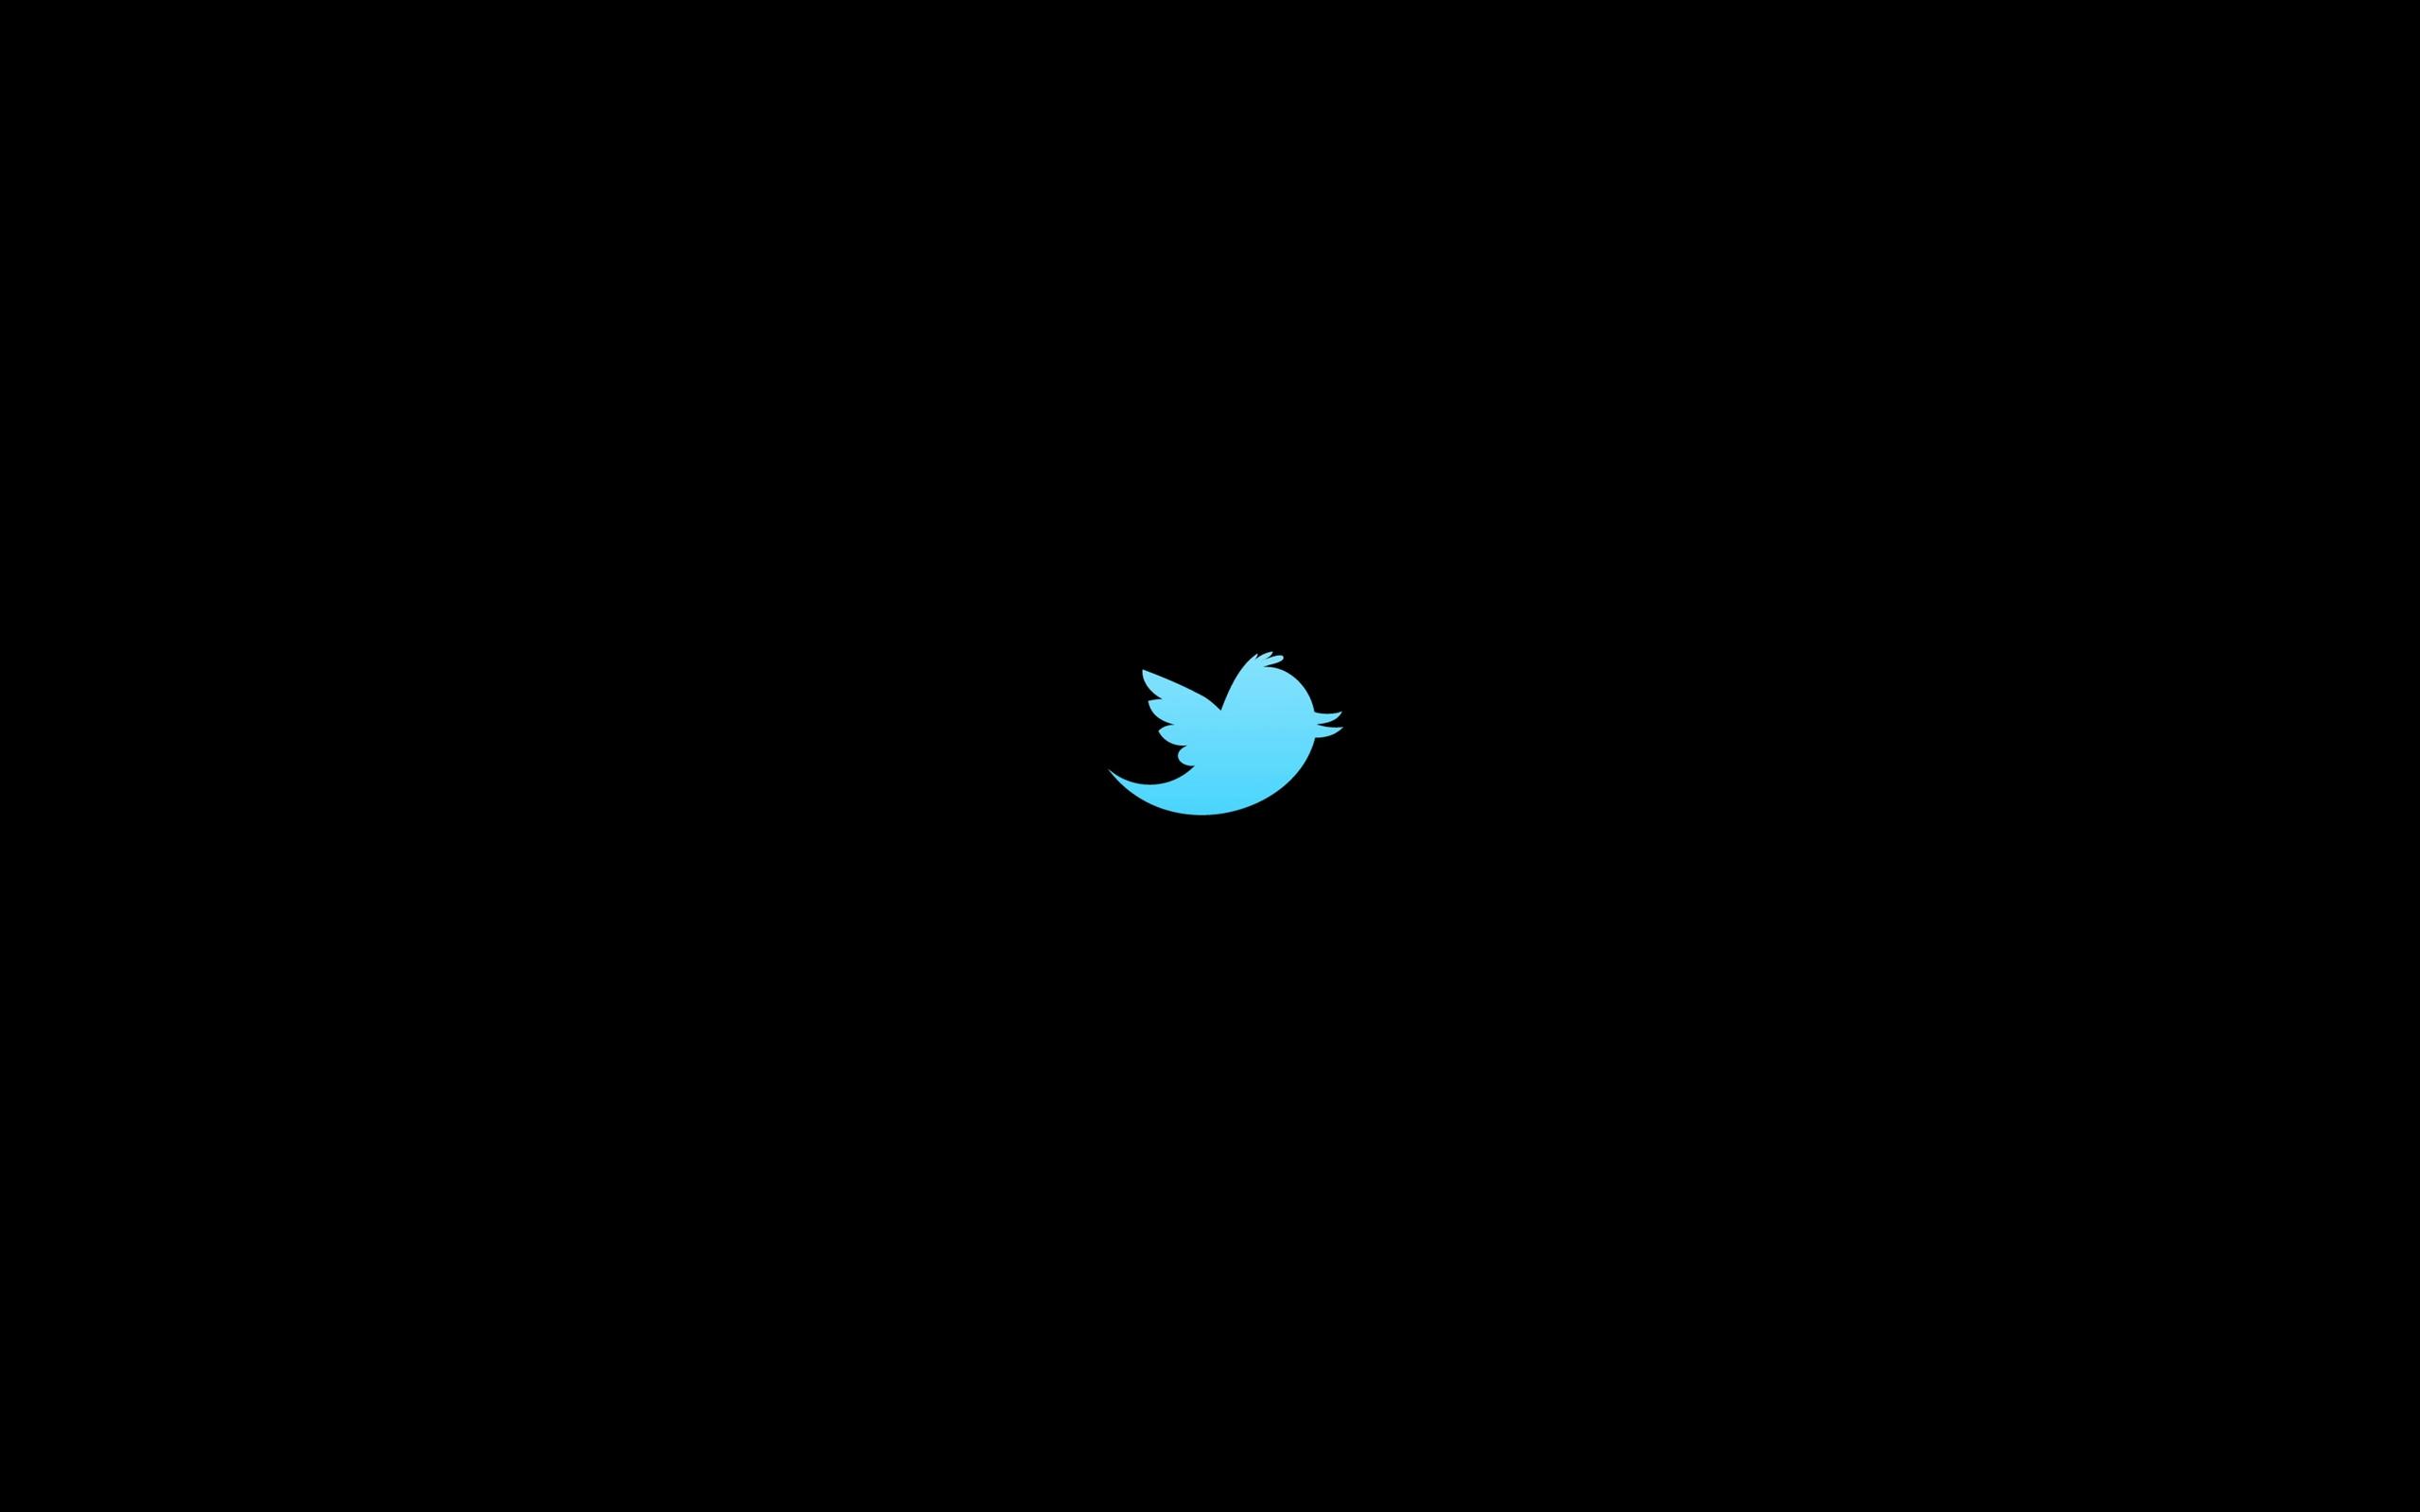 twitter takipci kasma para robotu en iyi twitter botu instagram botu ve seo araclari Twitter Takipci Arttirma Hilesi Siteleri 2020 Blog Araci